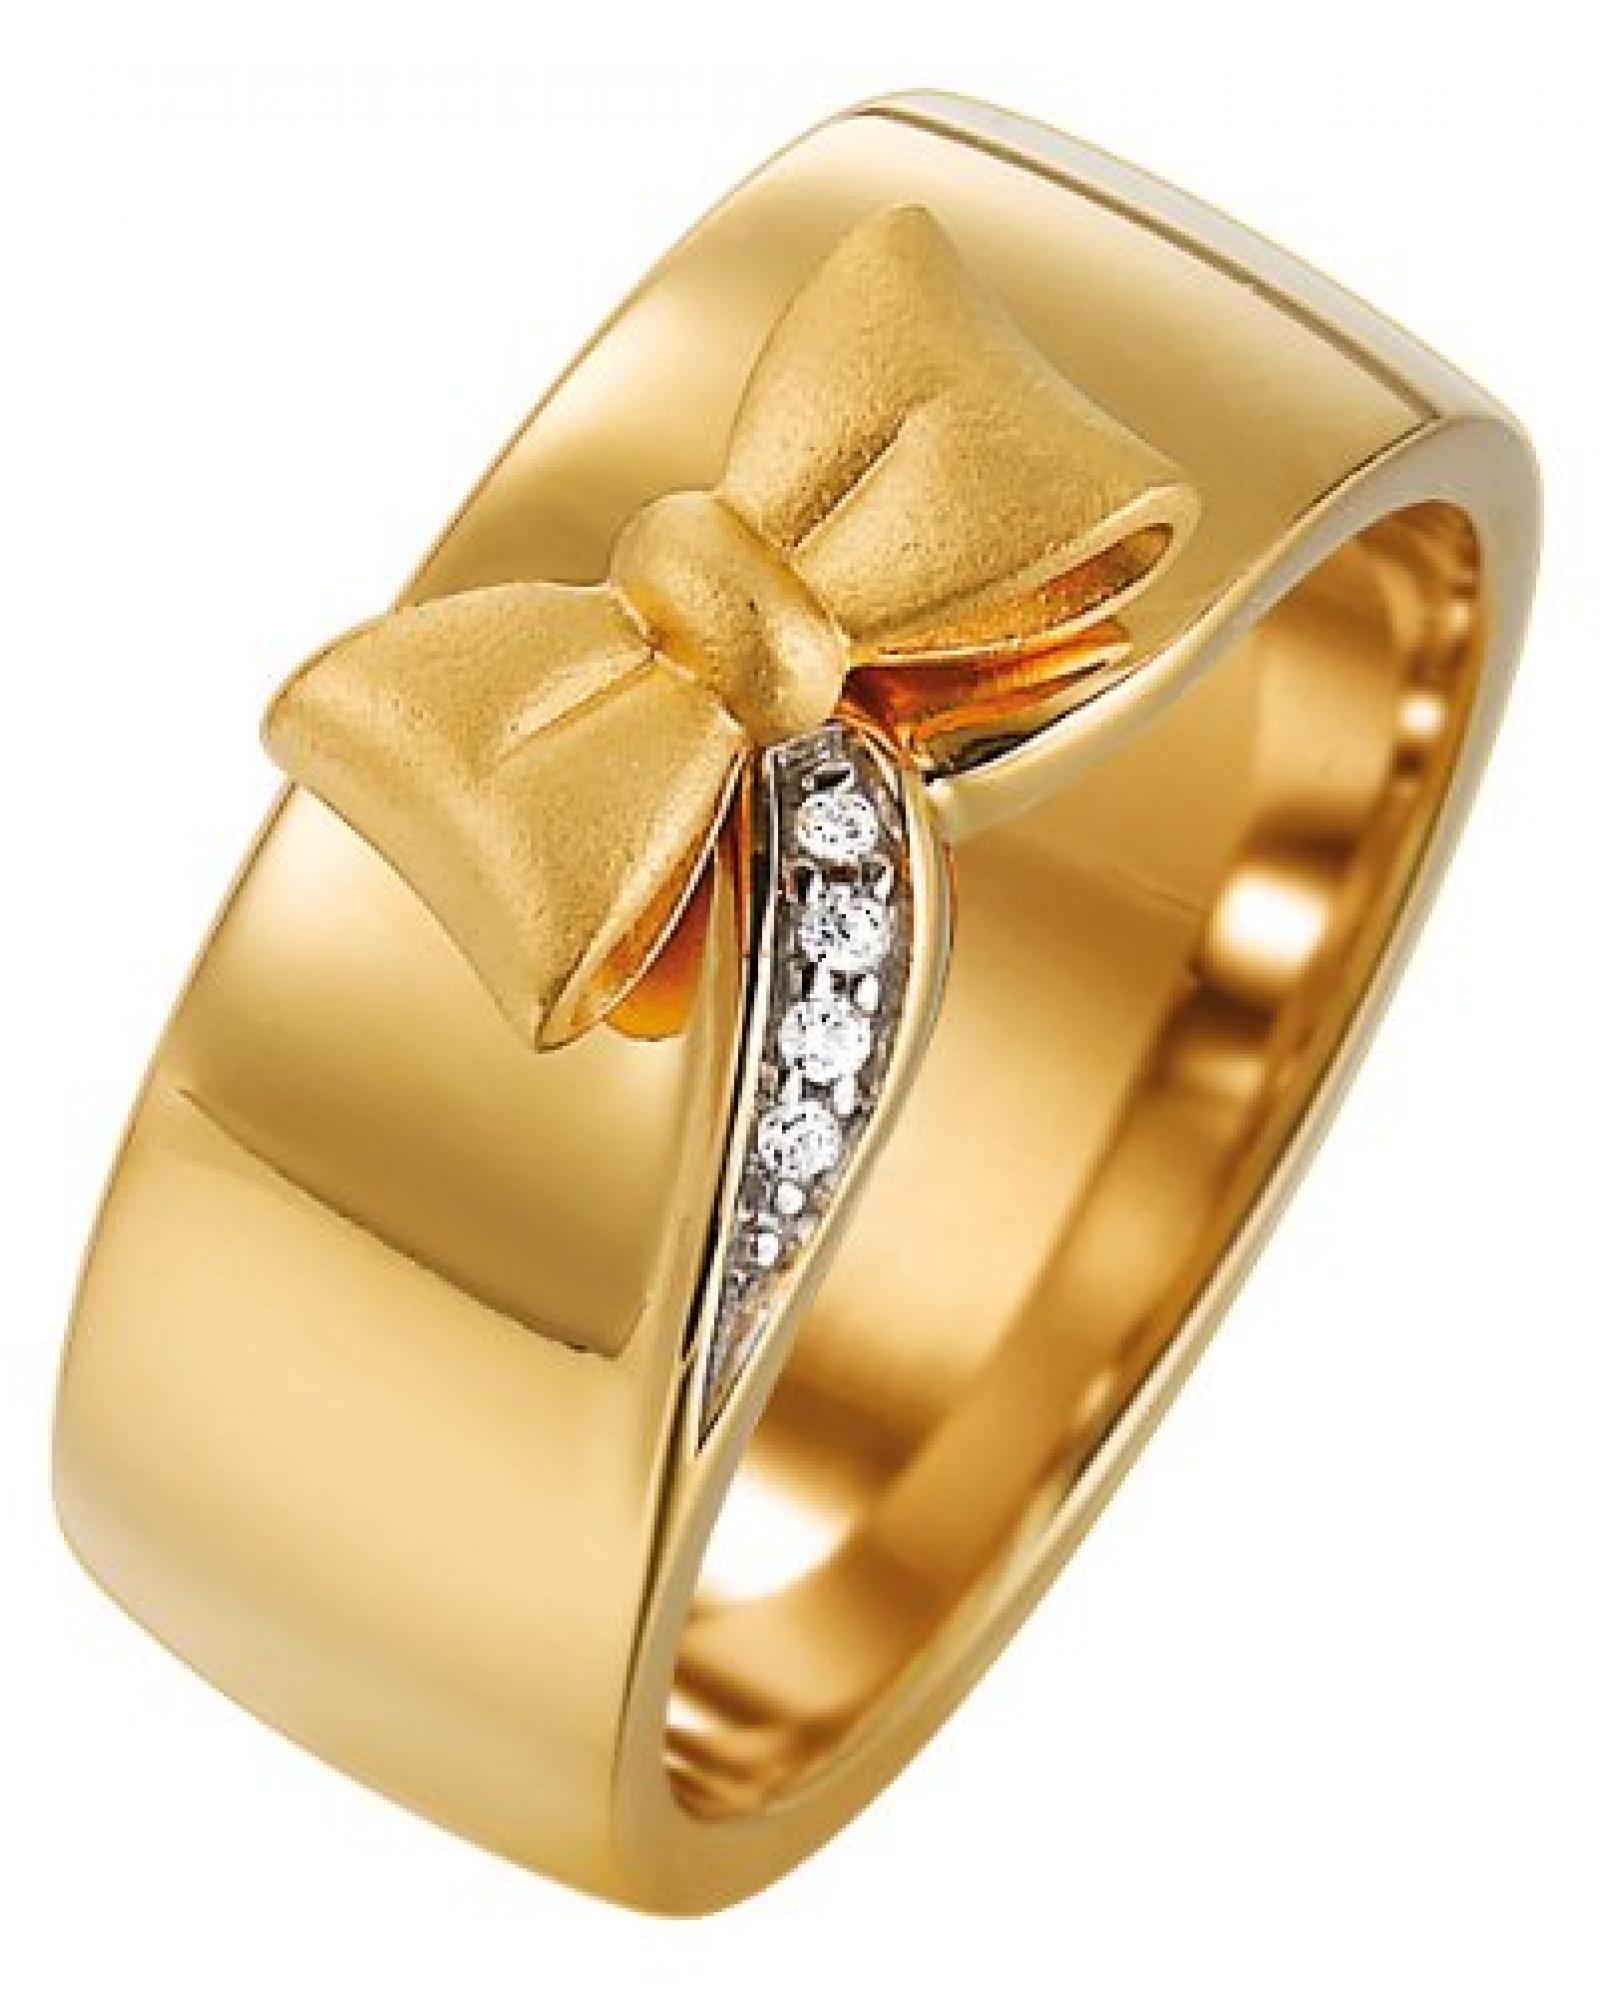 Pierre Cardin Damen-Ring 925 Sterling Silber rhodiniert Kristall Zirkonia Papillon weiß Gr.57 (18.1) PCRG90376B180